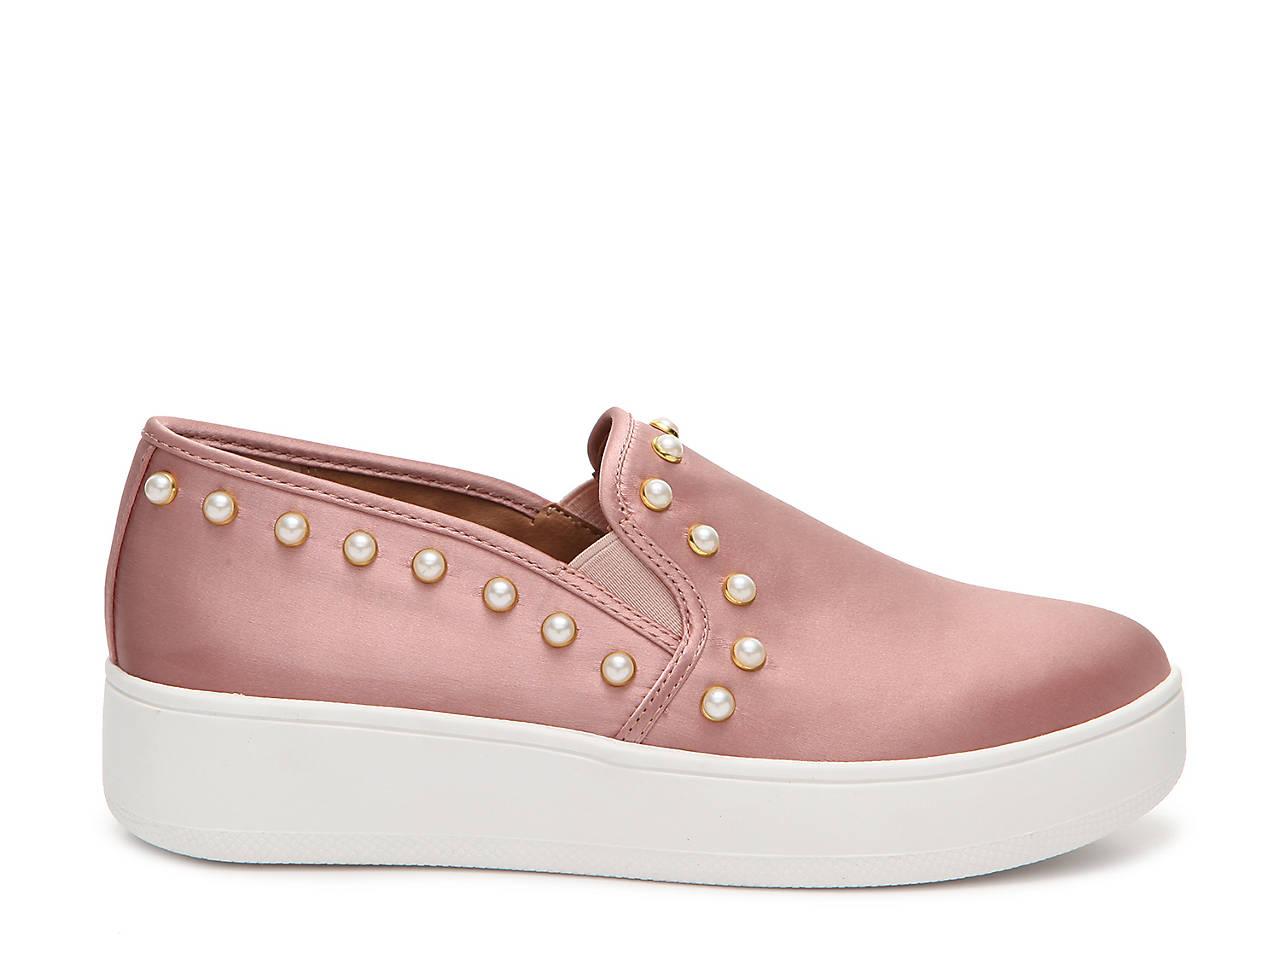 45cf42d71a1 Steve Madden Genette Platform Sneaker Men s Shoes